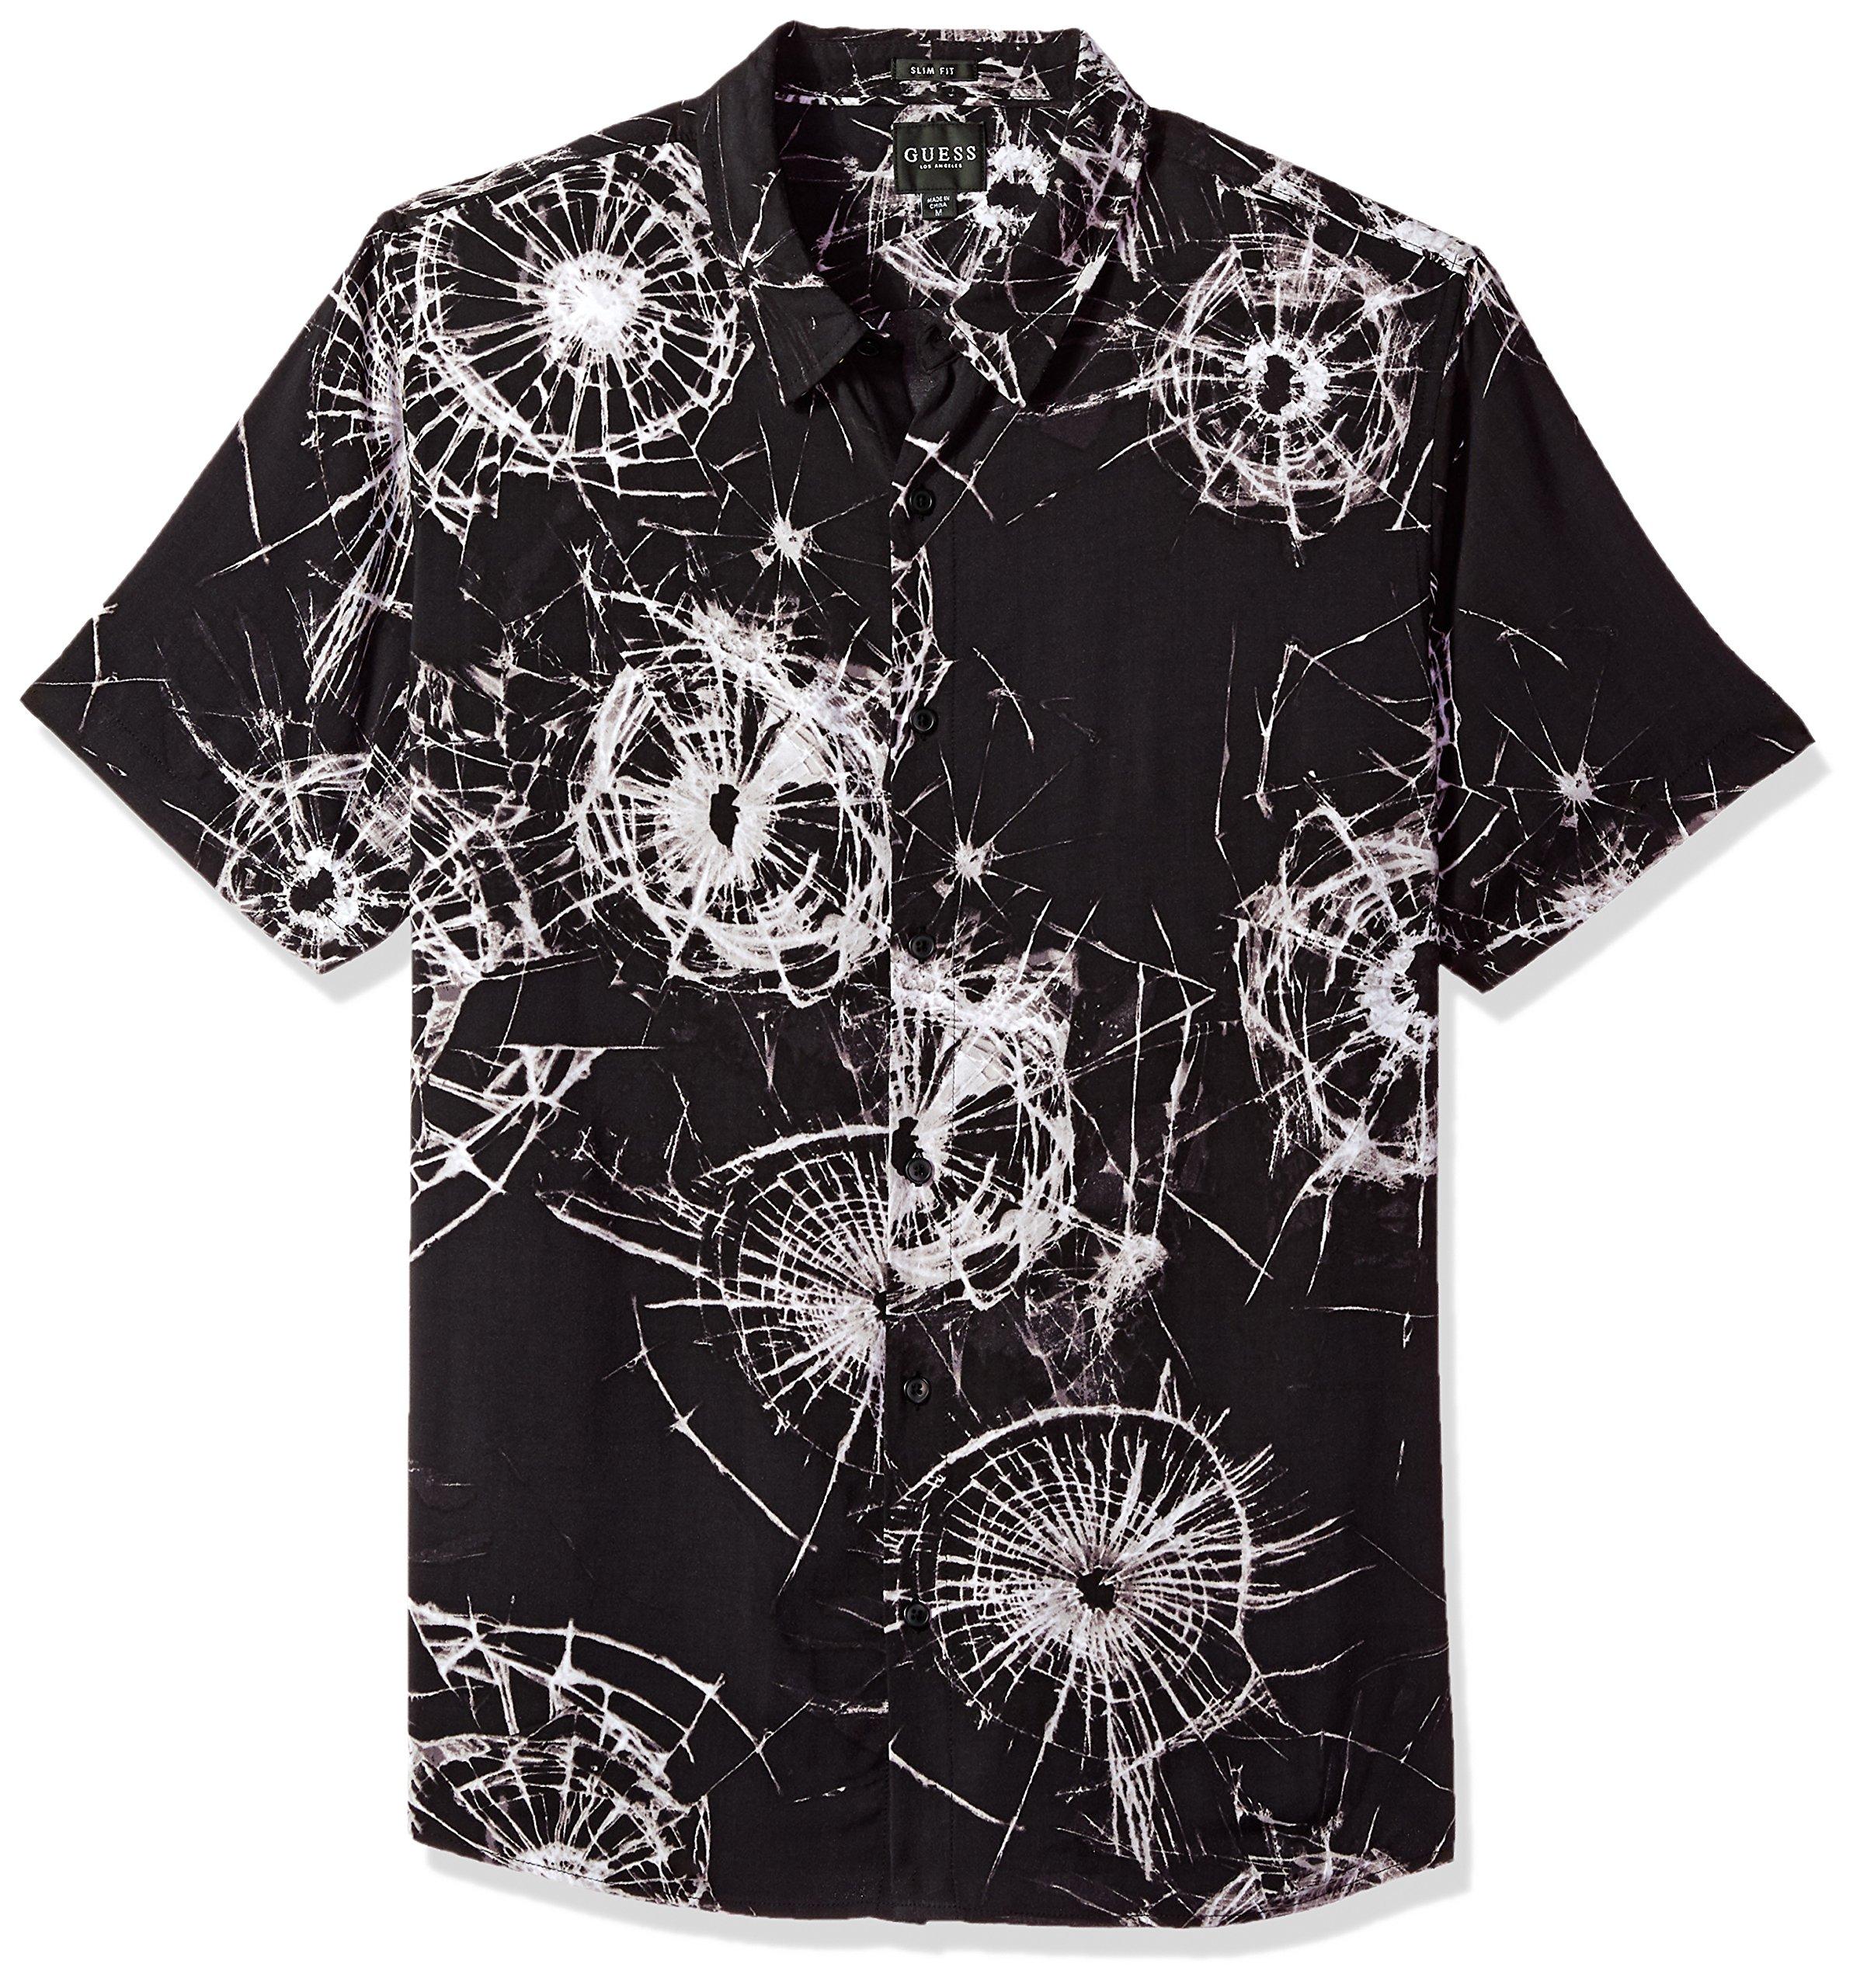 GUESS Men's Short Sleeve Shattered Glass Print Shirt Jet Black, Large